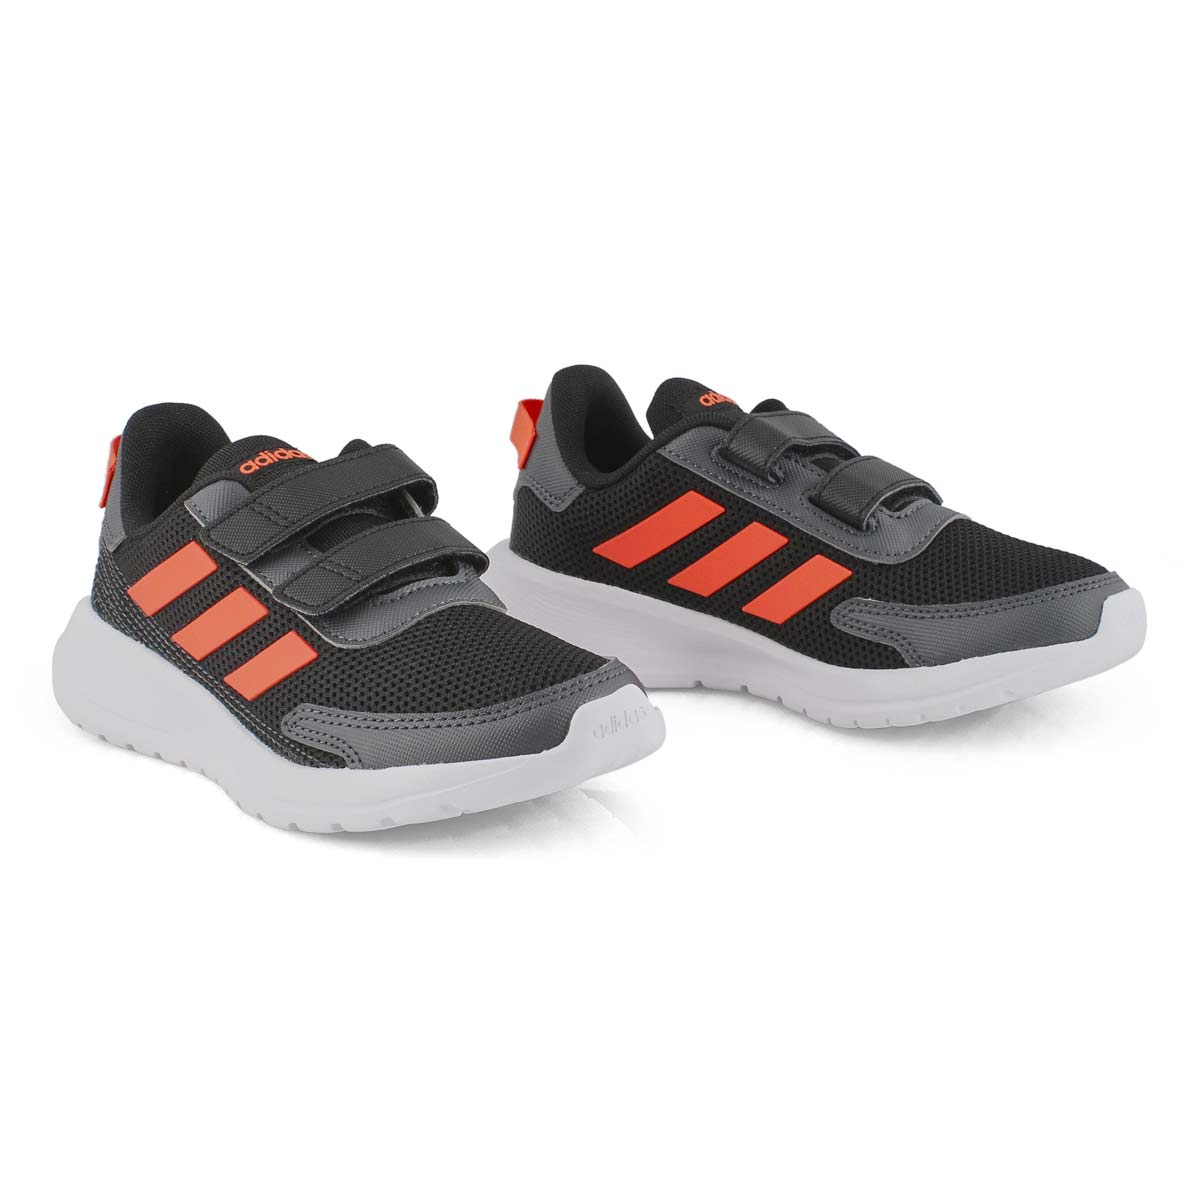 Bys Tensaur C black/red/grey sneaker